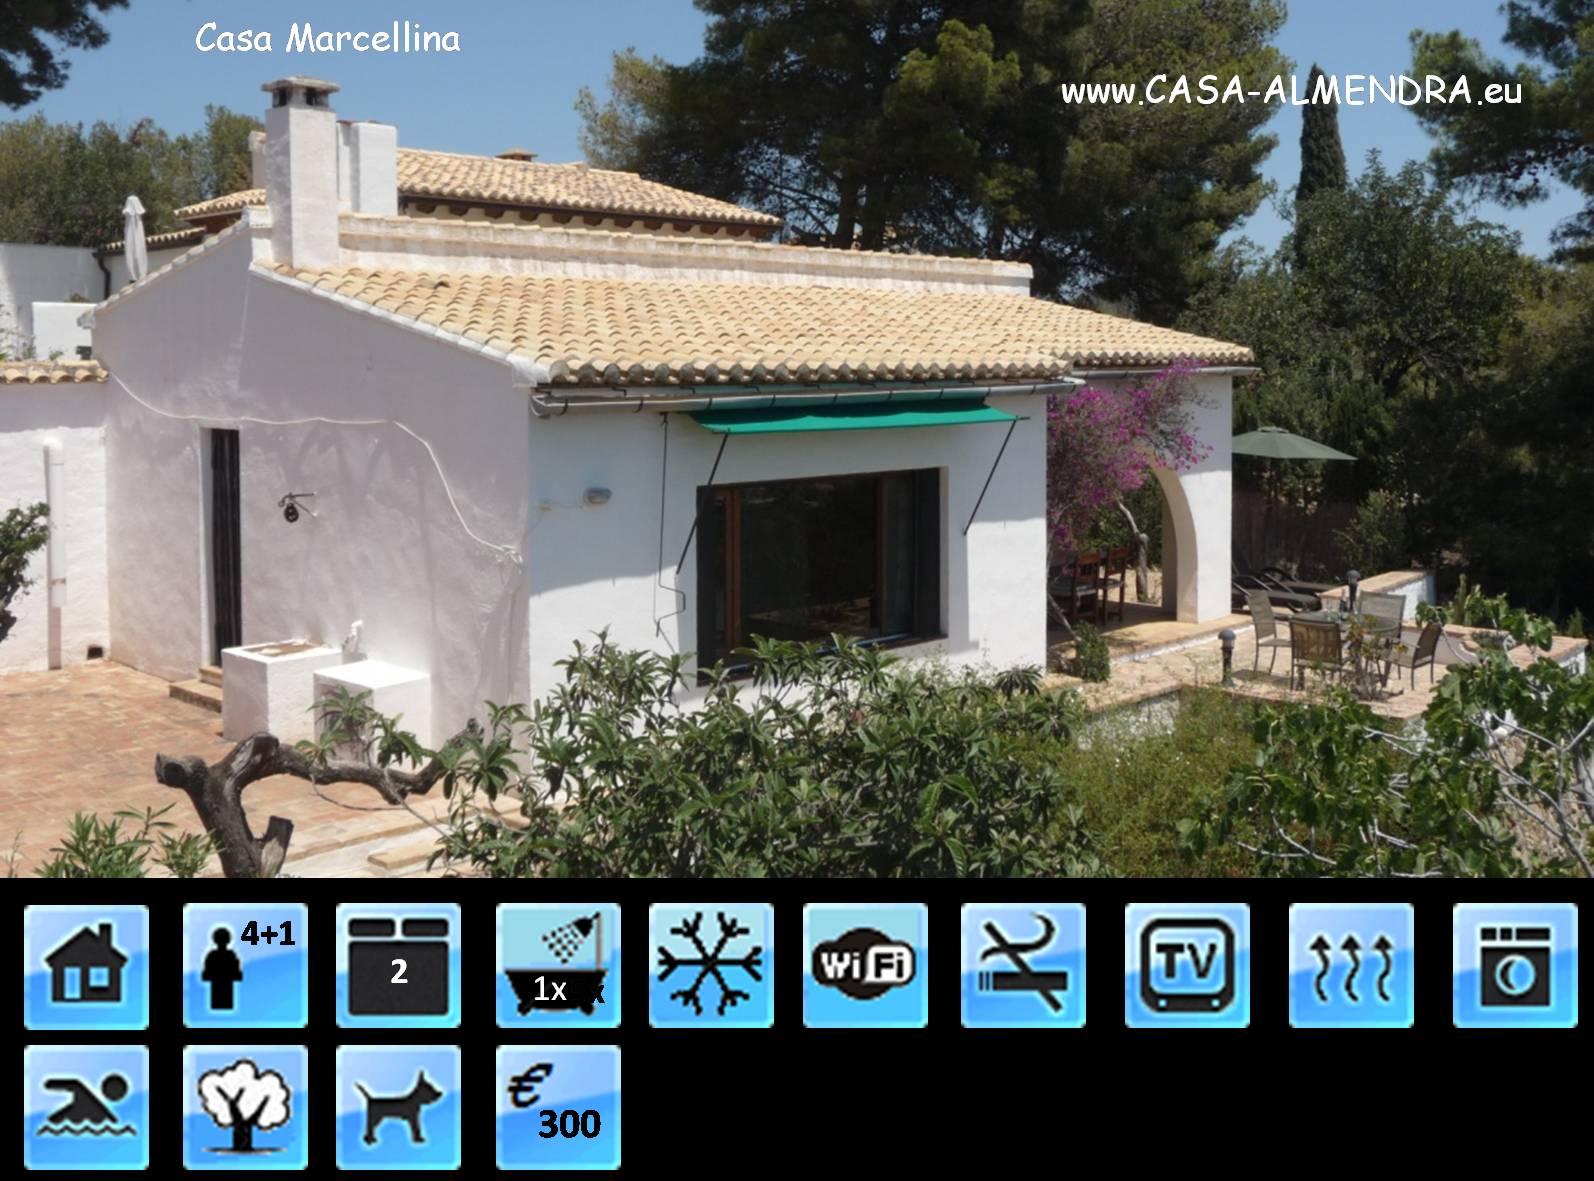 Verhuurwoning Casa Marcellina, Casa Almendra, Calpe, Costa Blanca, Spanje